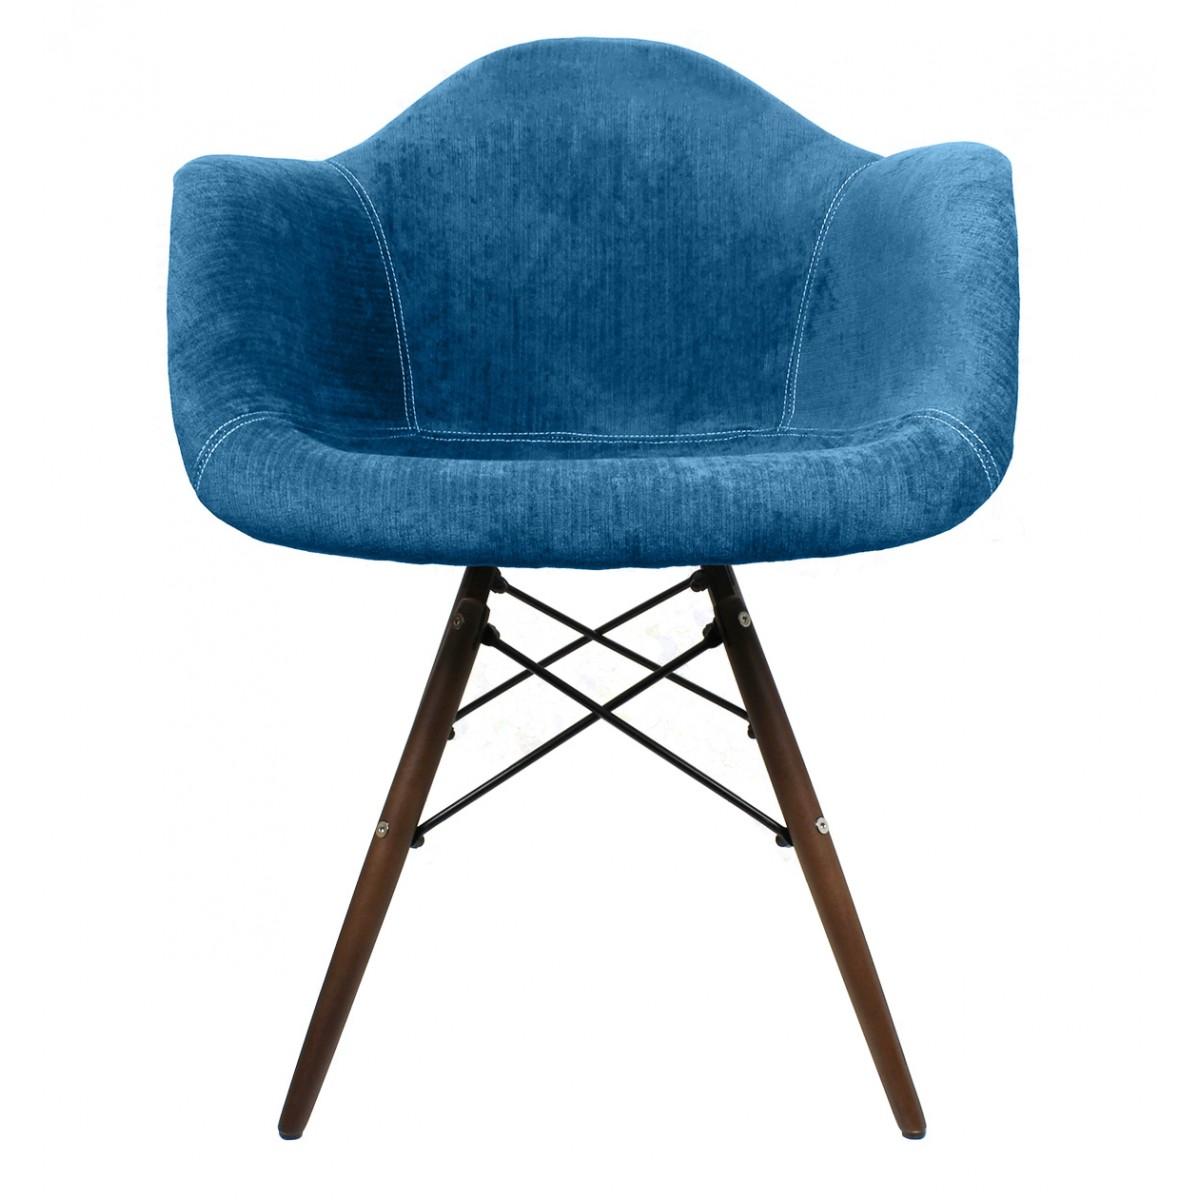 Superb Aqua Blue Velvet Fabric Accent Arm Chair Caraccident5 Cool Chair Designs And Ideas Caraccident5Info